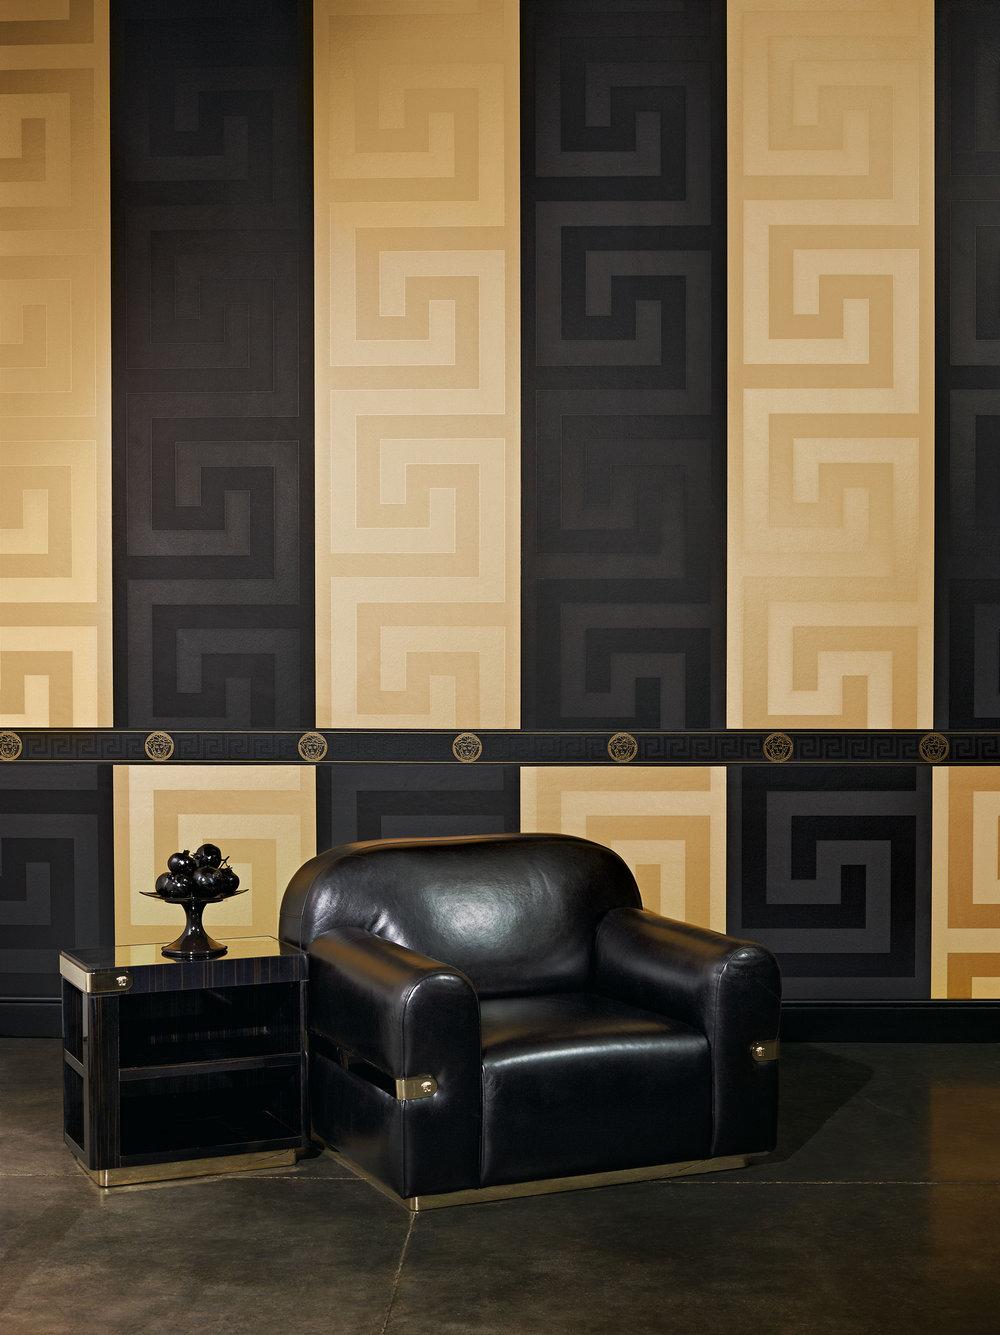 Versace Greek Key Border Black  - Product code: 93522-4